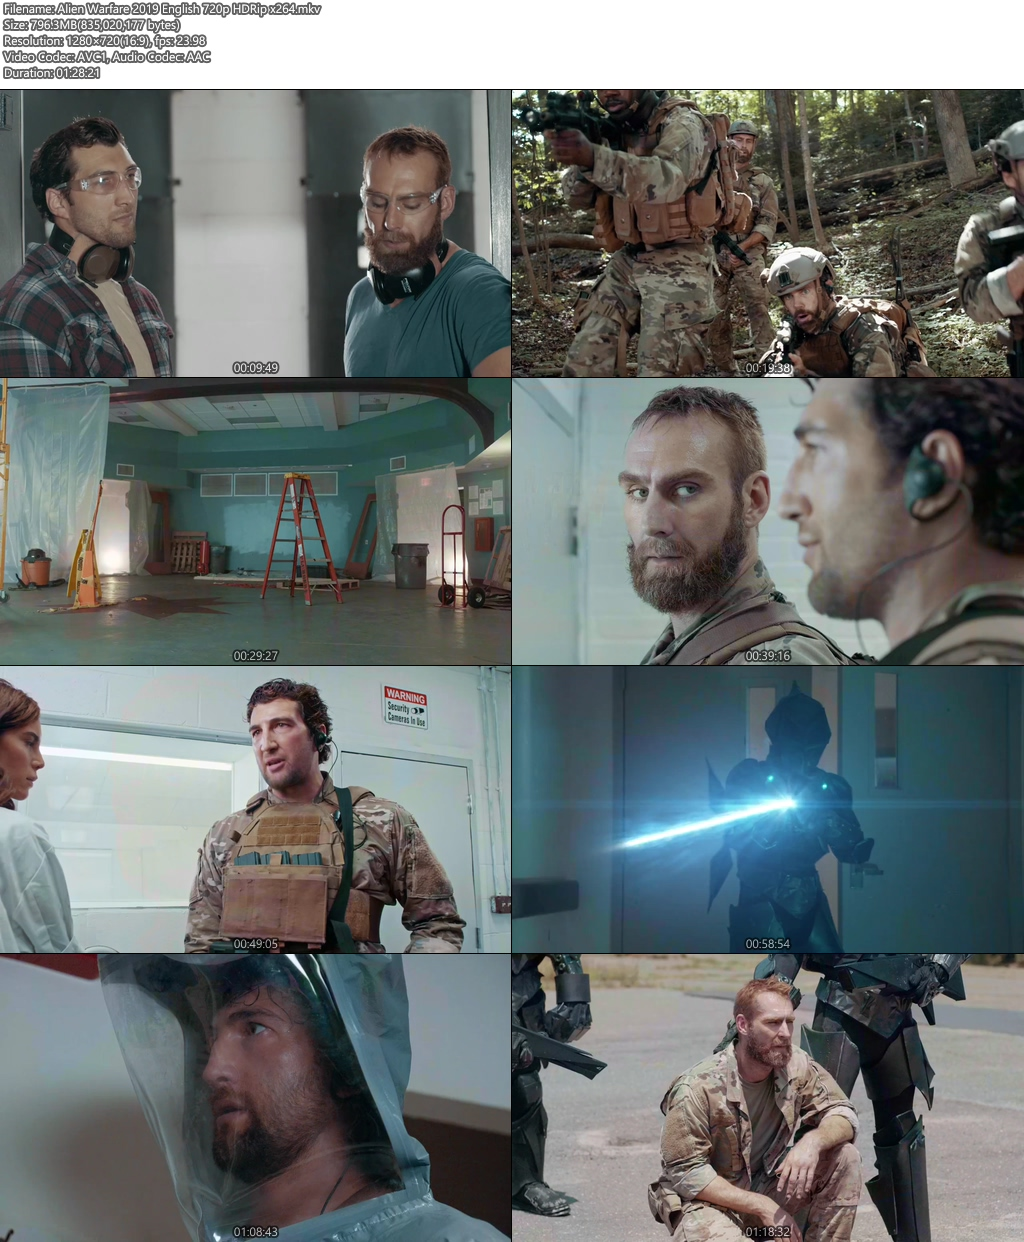 Alien Warfare 2019 English 720p HDRip x264 | 480p 300MB | 100MB HEVC Screenshot